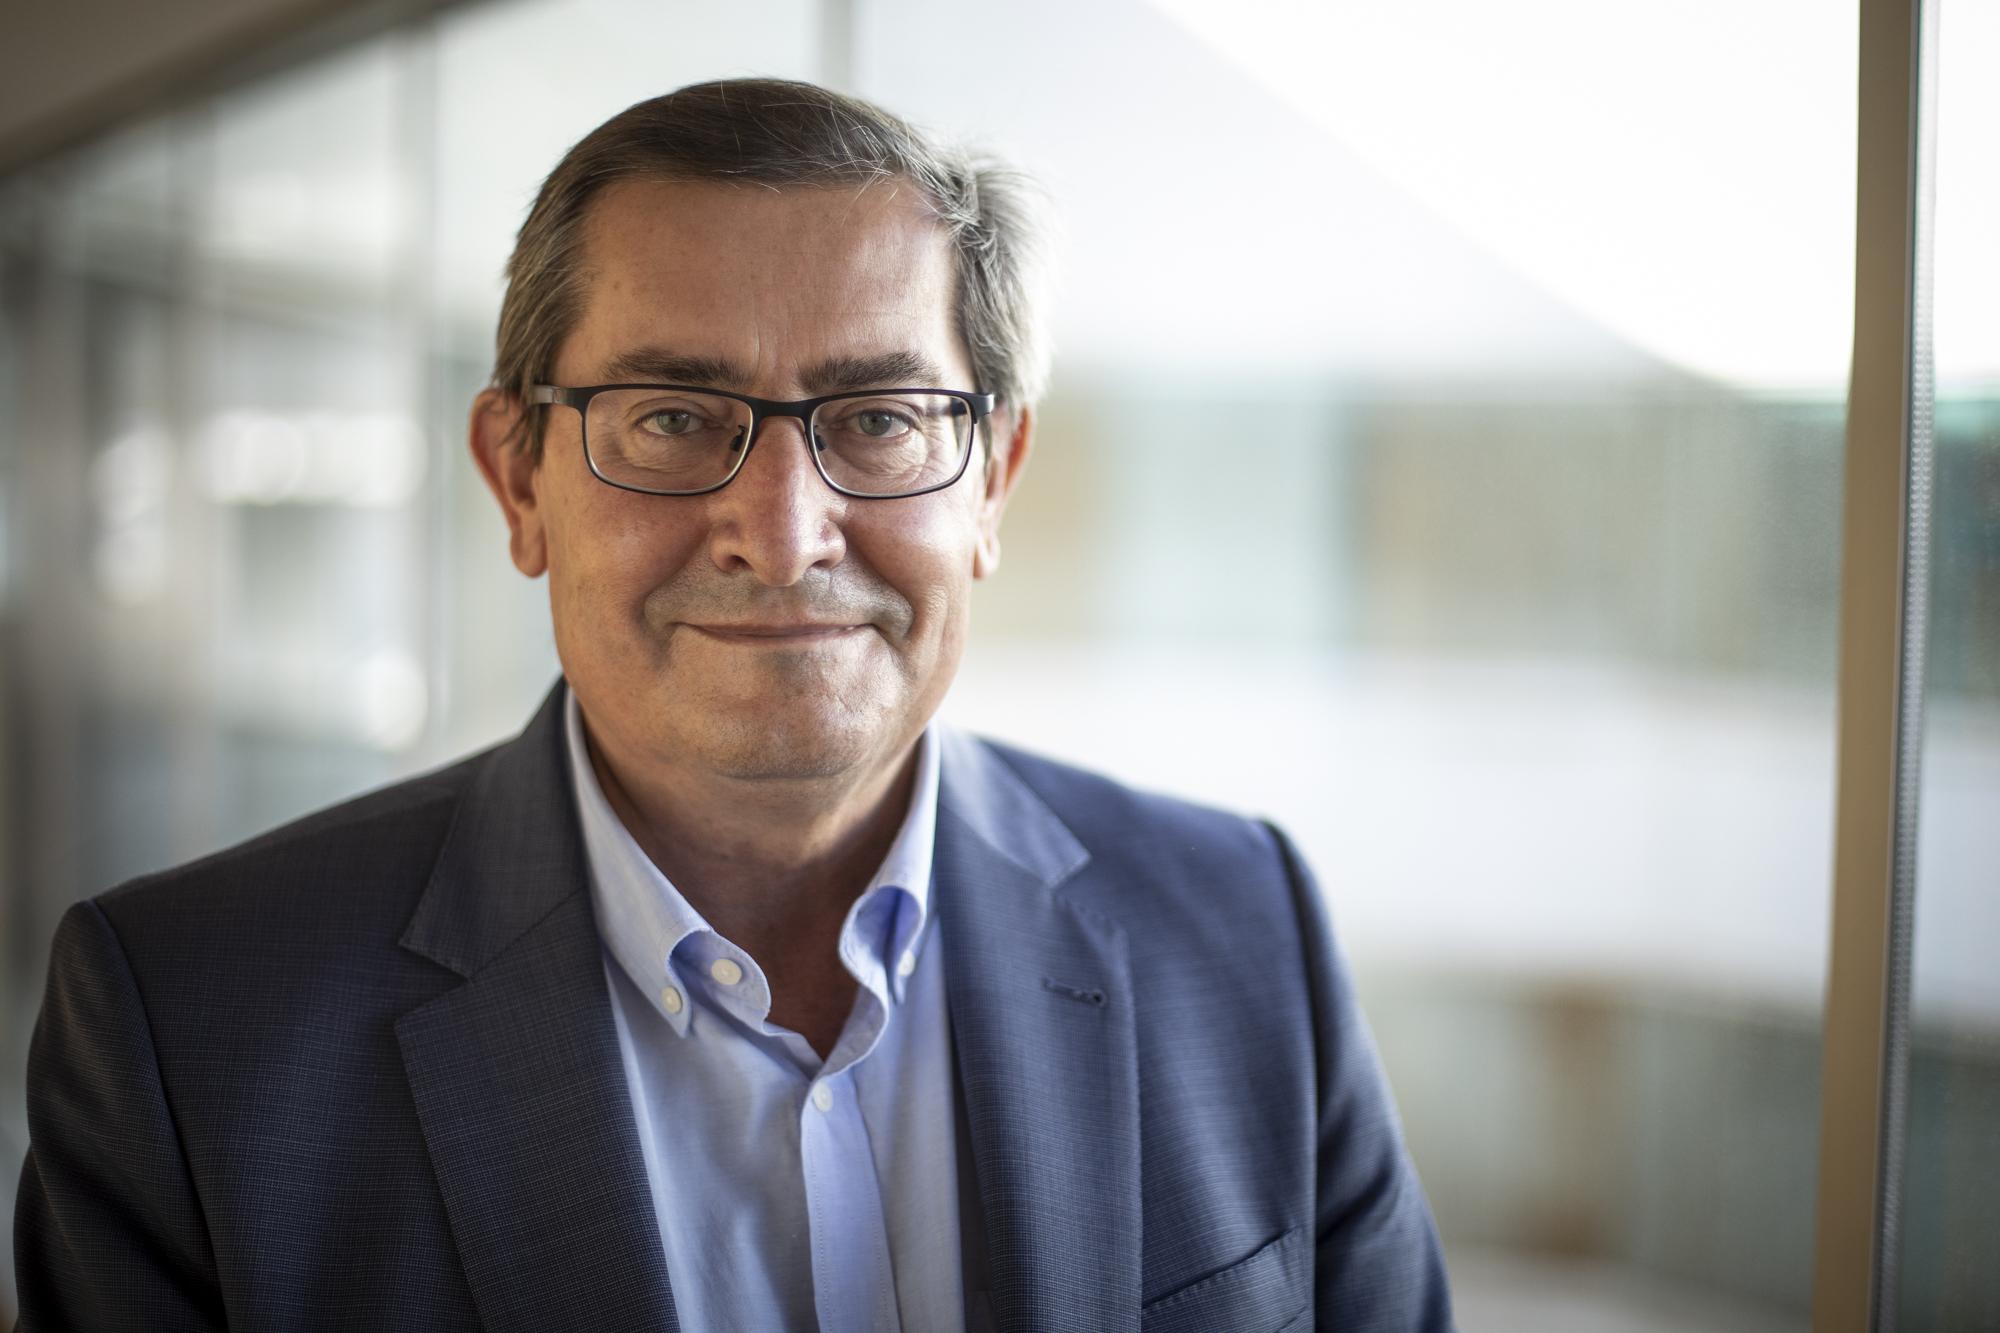 jose-entrena-presidente-diputacion-de-granada